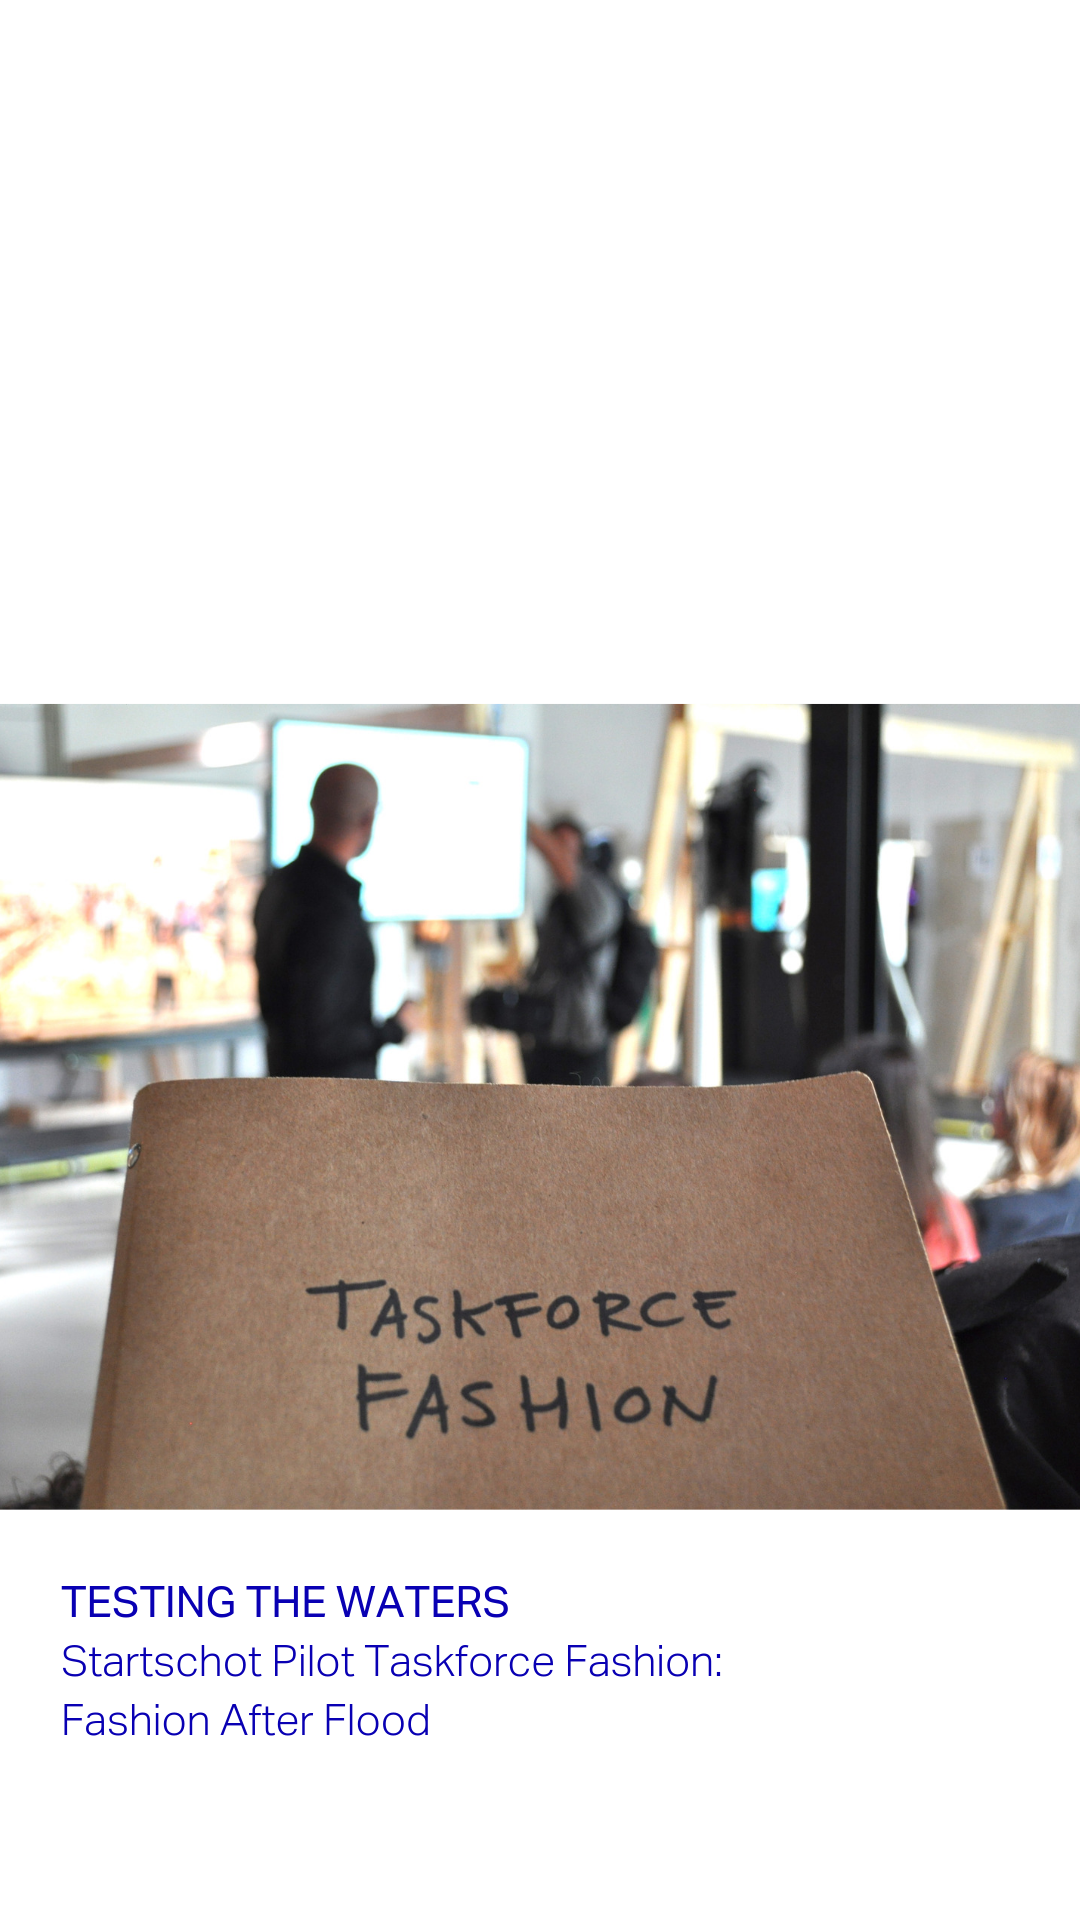 29Taskforce-Fashion-Fashion-After-Flood-kennismaking-Amsterdampng.png